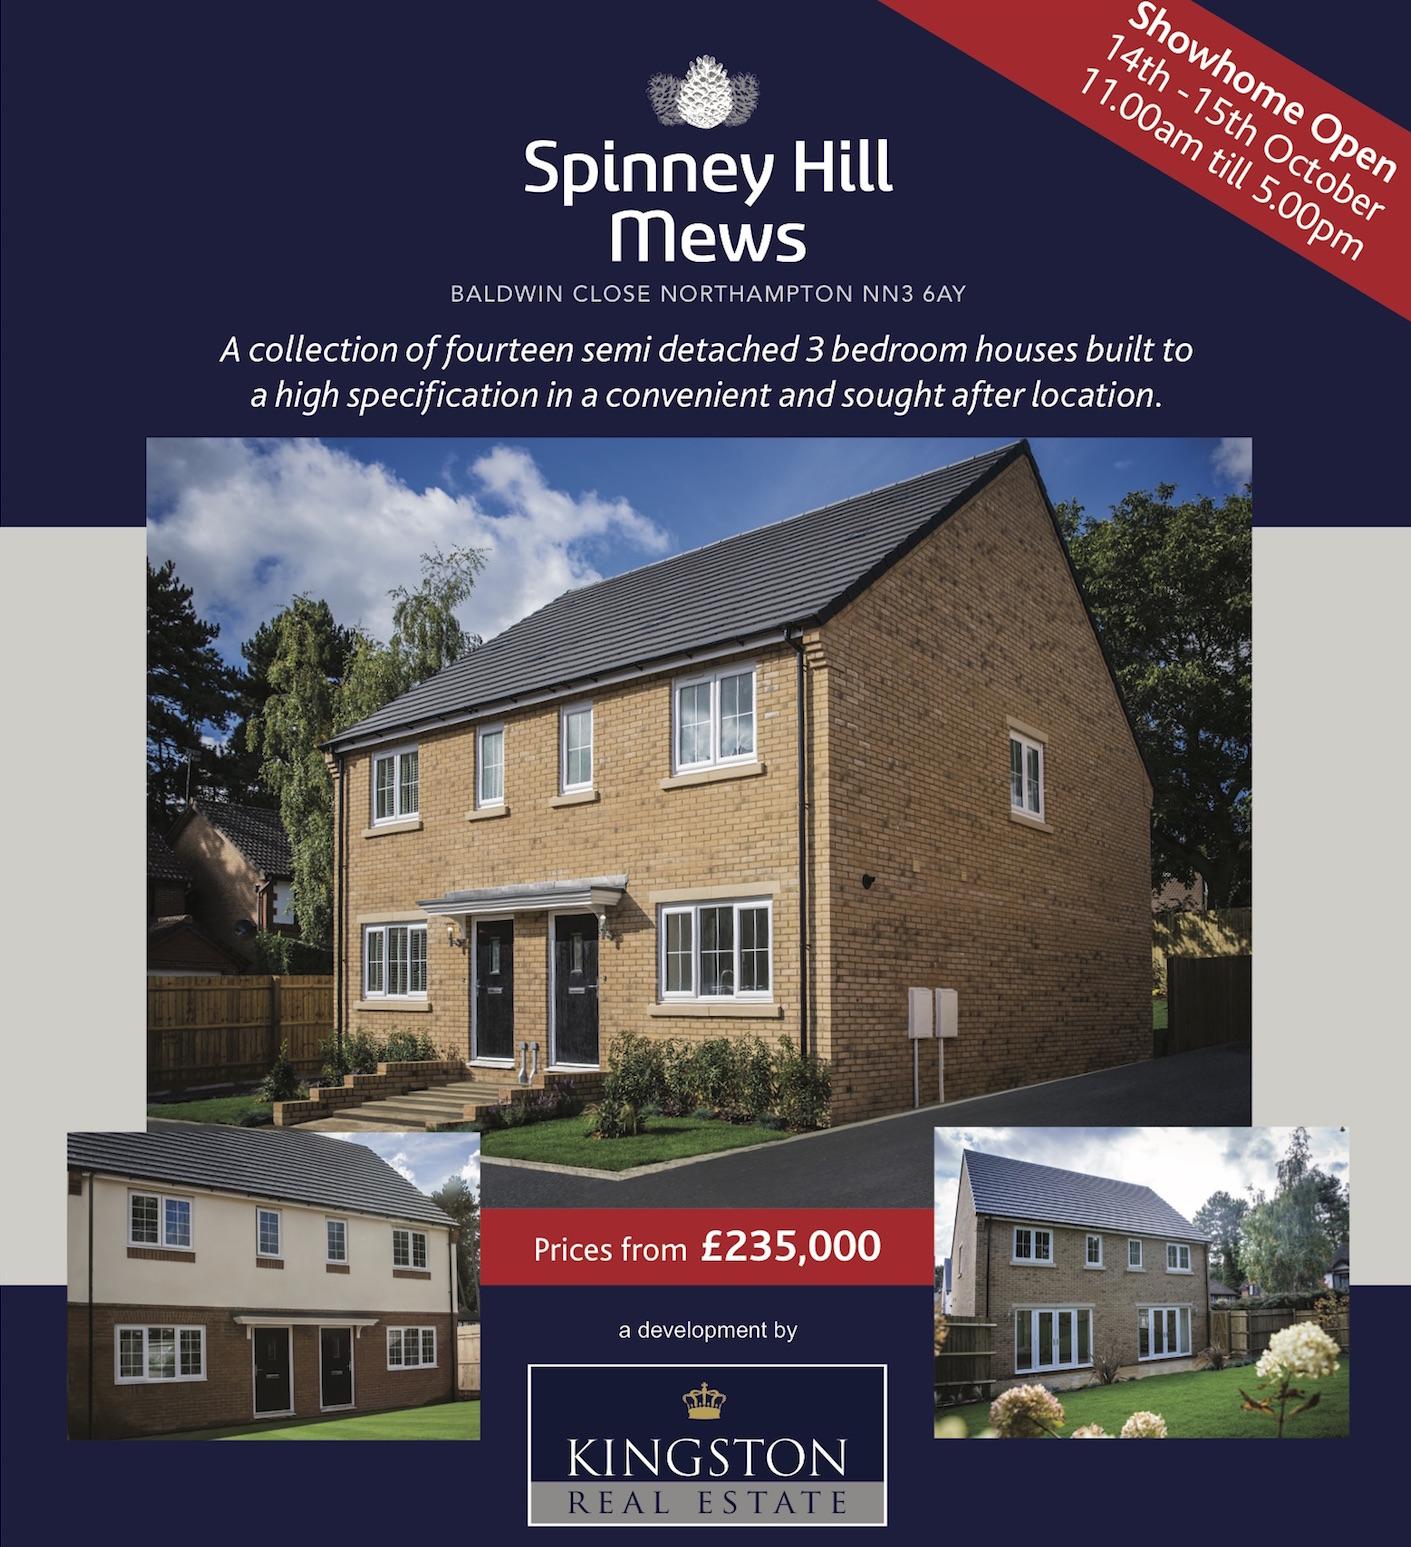 Kingston Property Developments